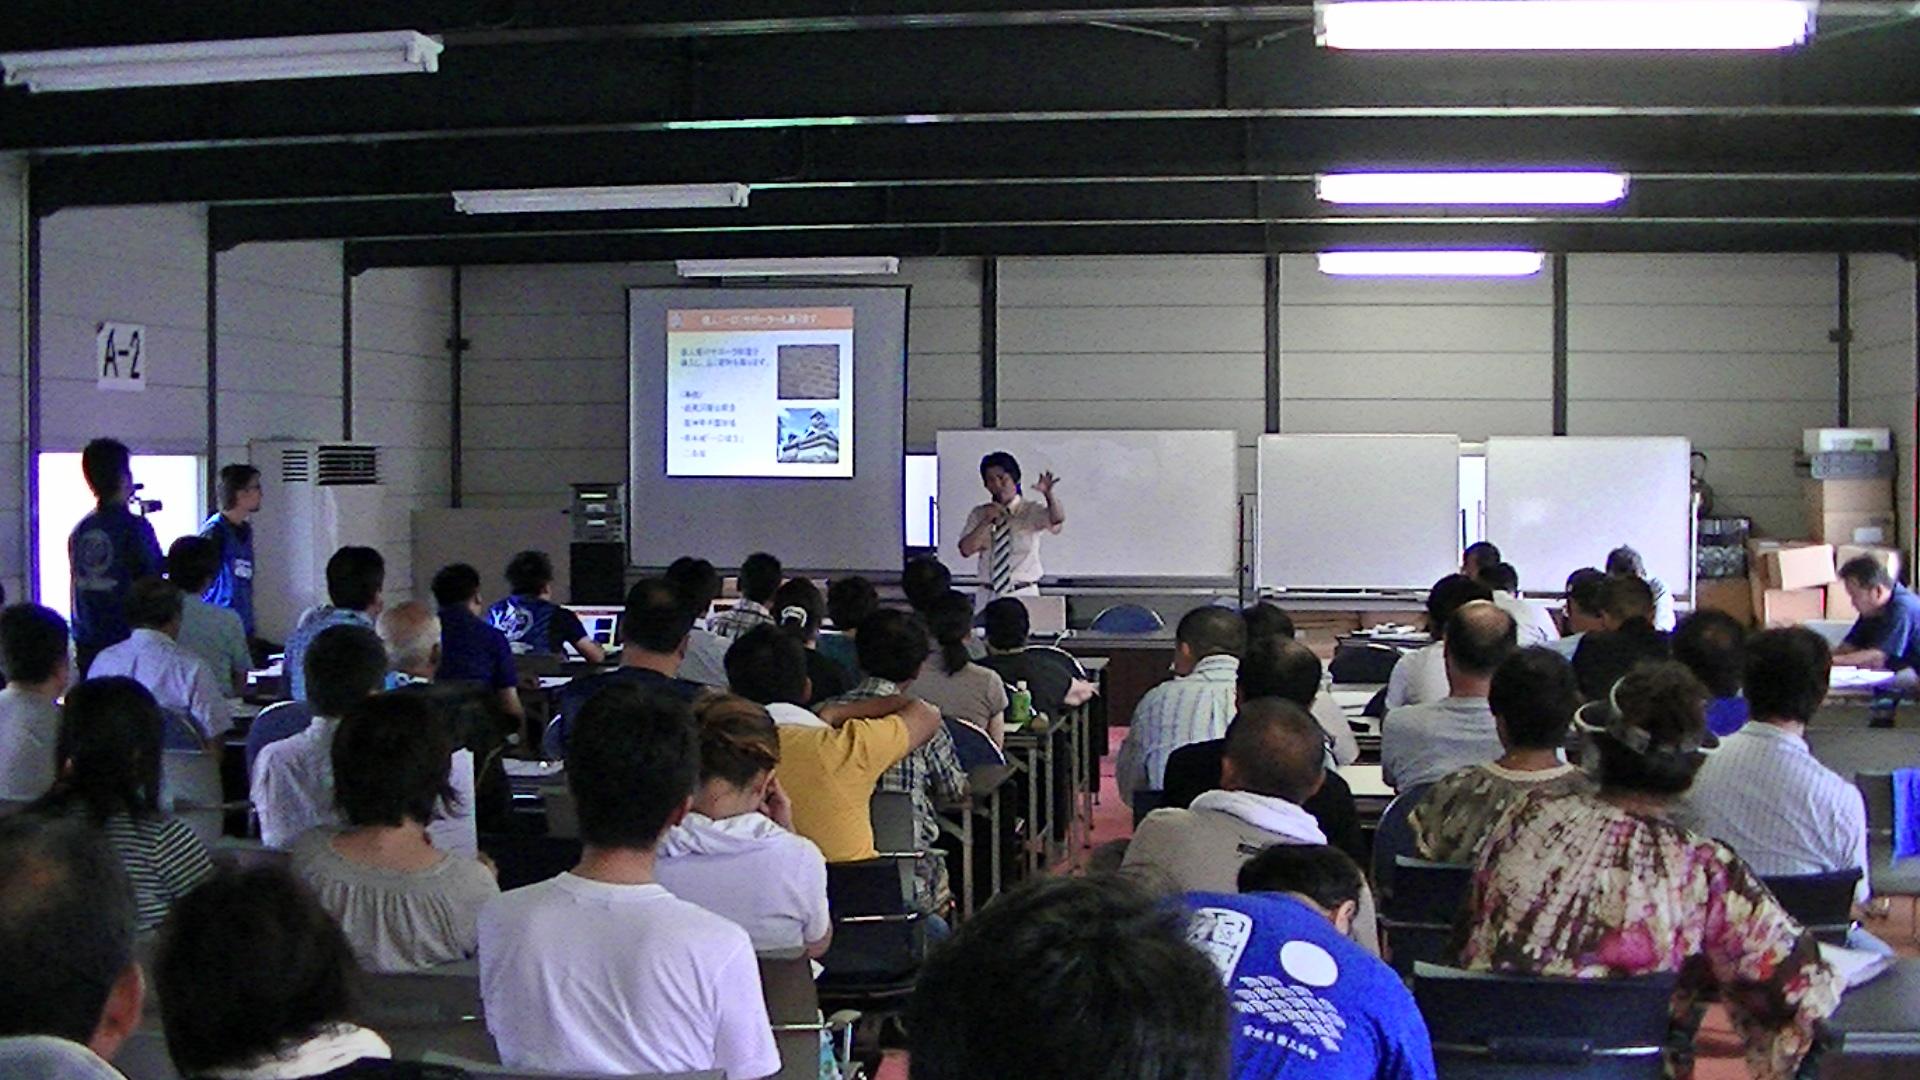 http://united-earth.jp/minamisanriku/PIC_2097.JPG